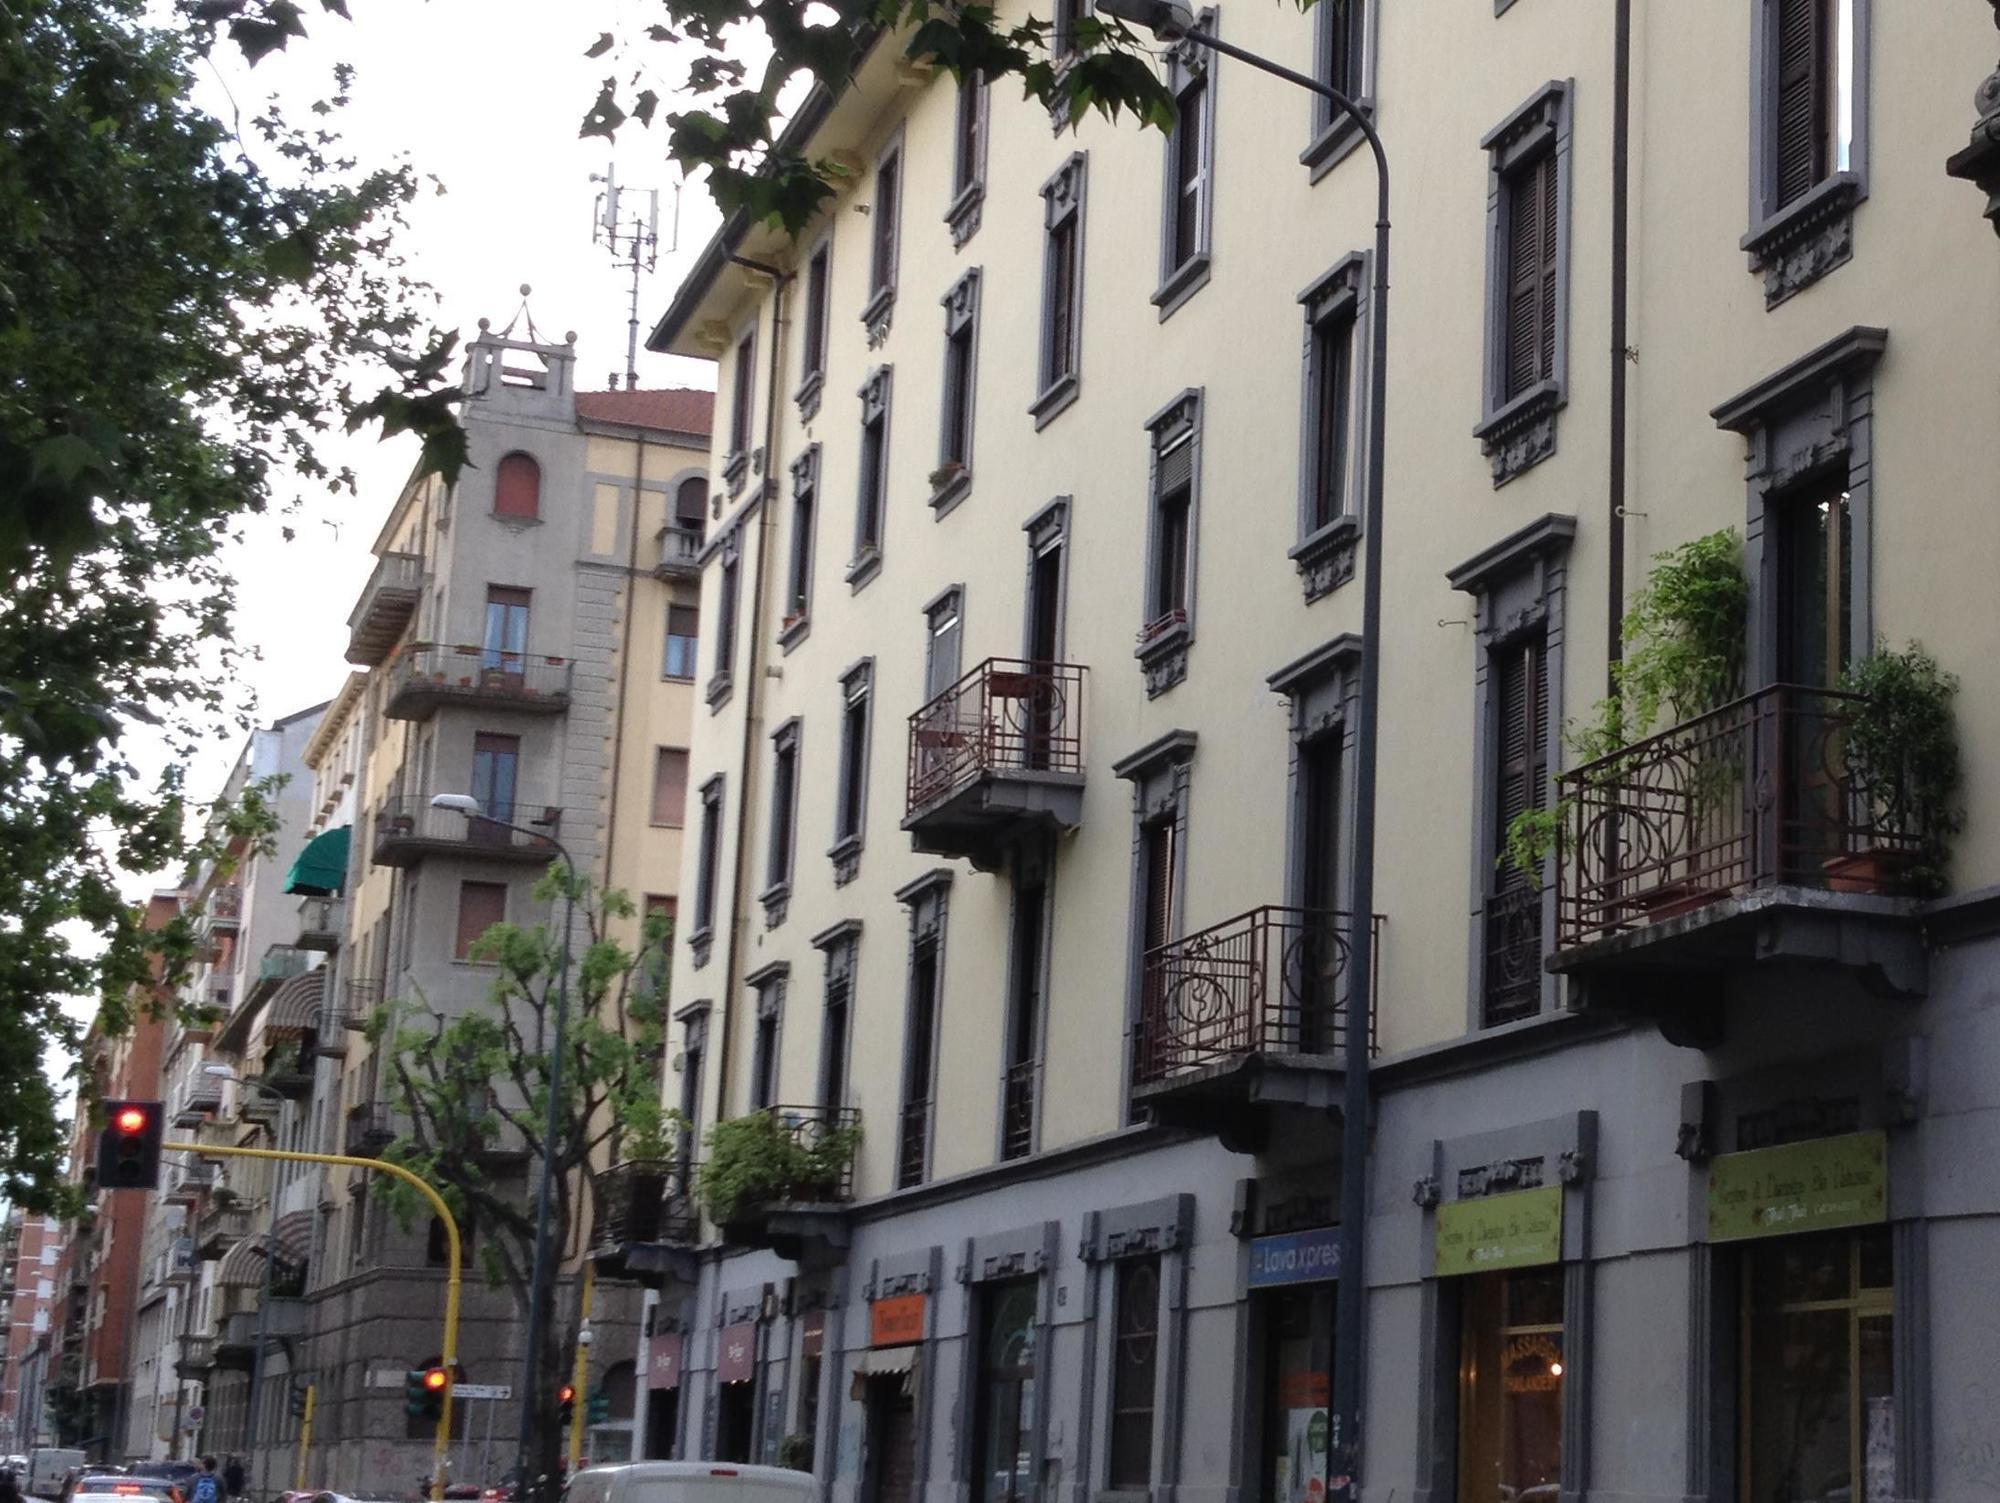 Fiera milano apartments milan for Milano fiera